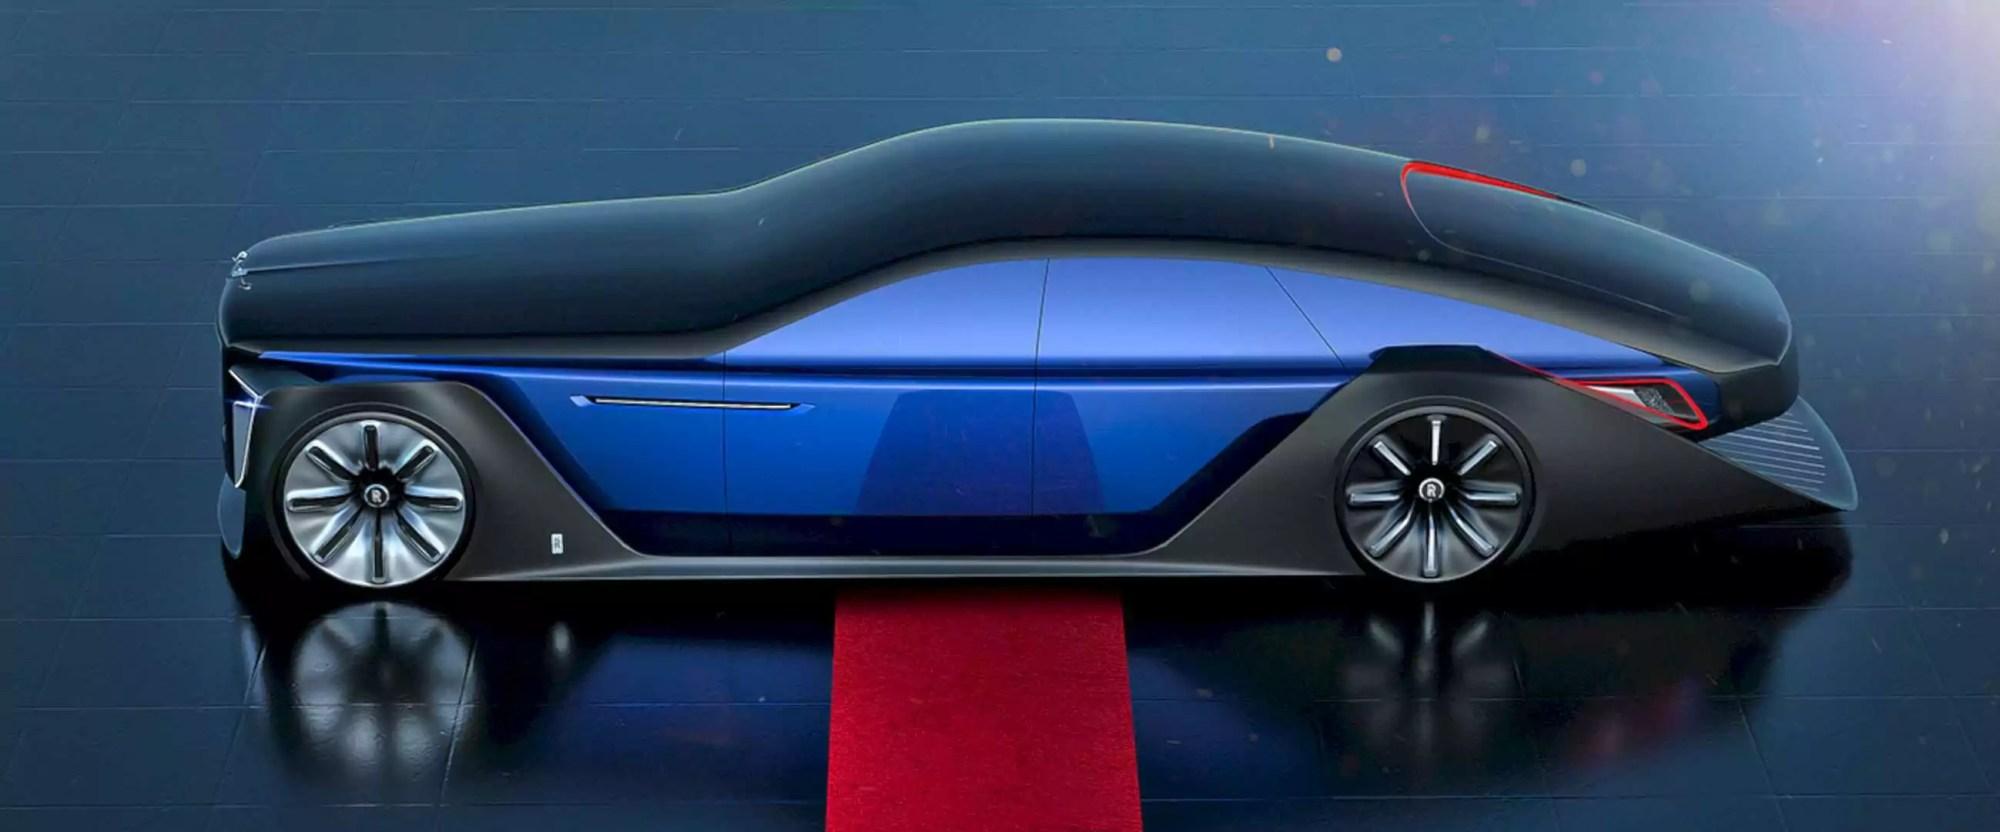 Rolls Royce Exterion Concept 2